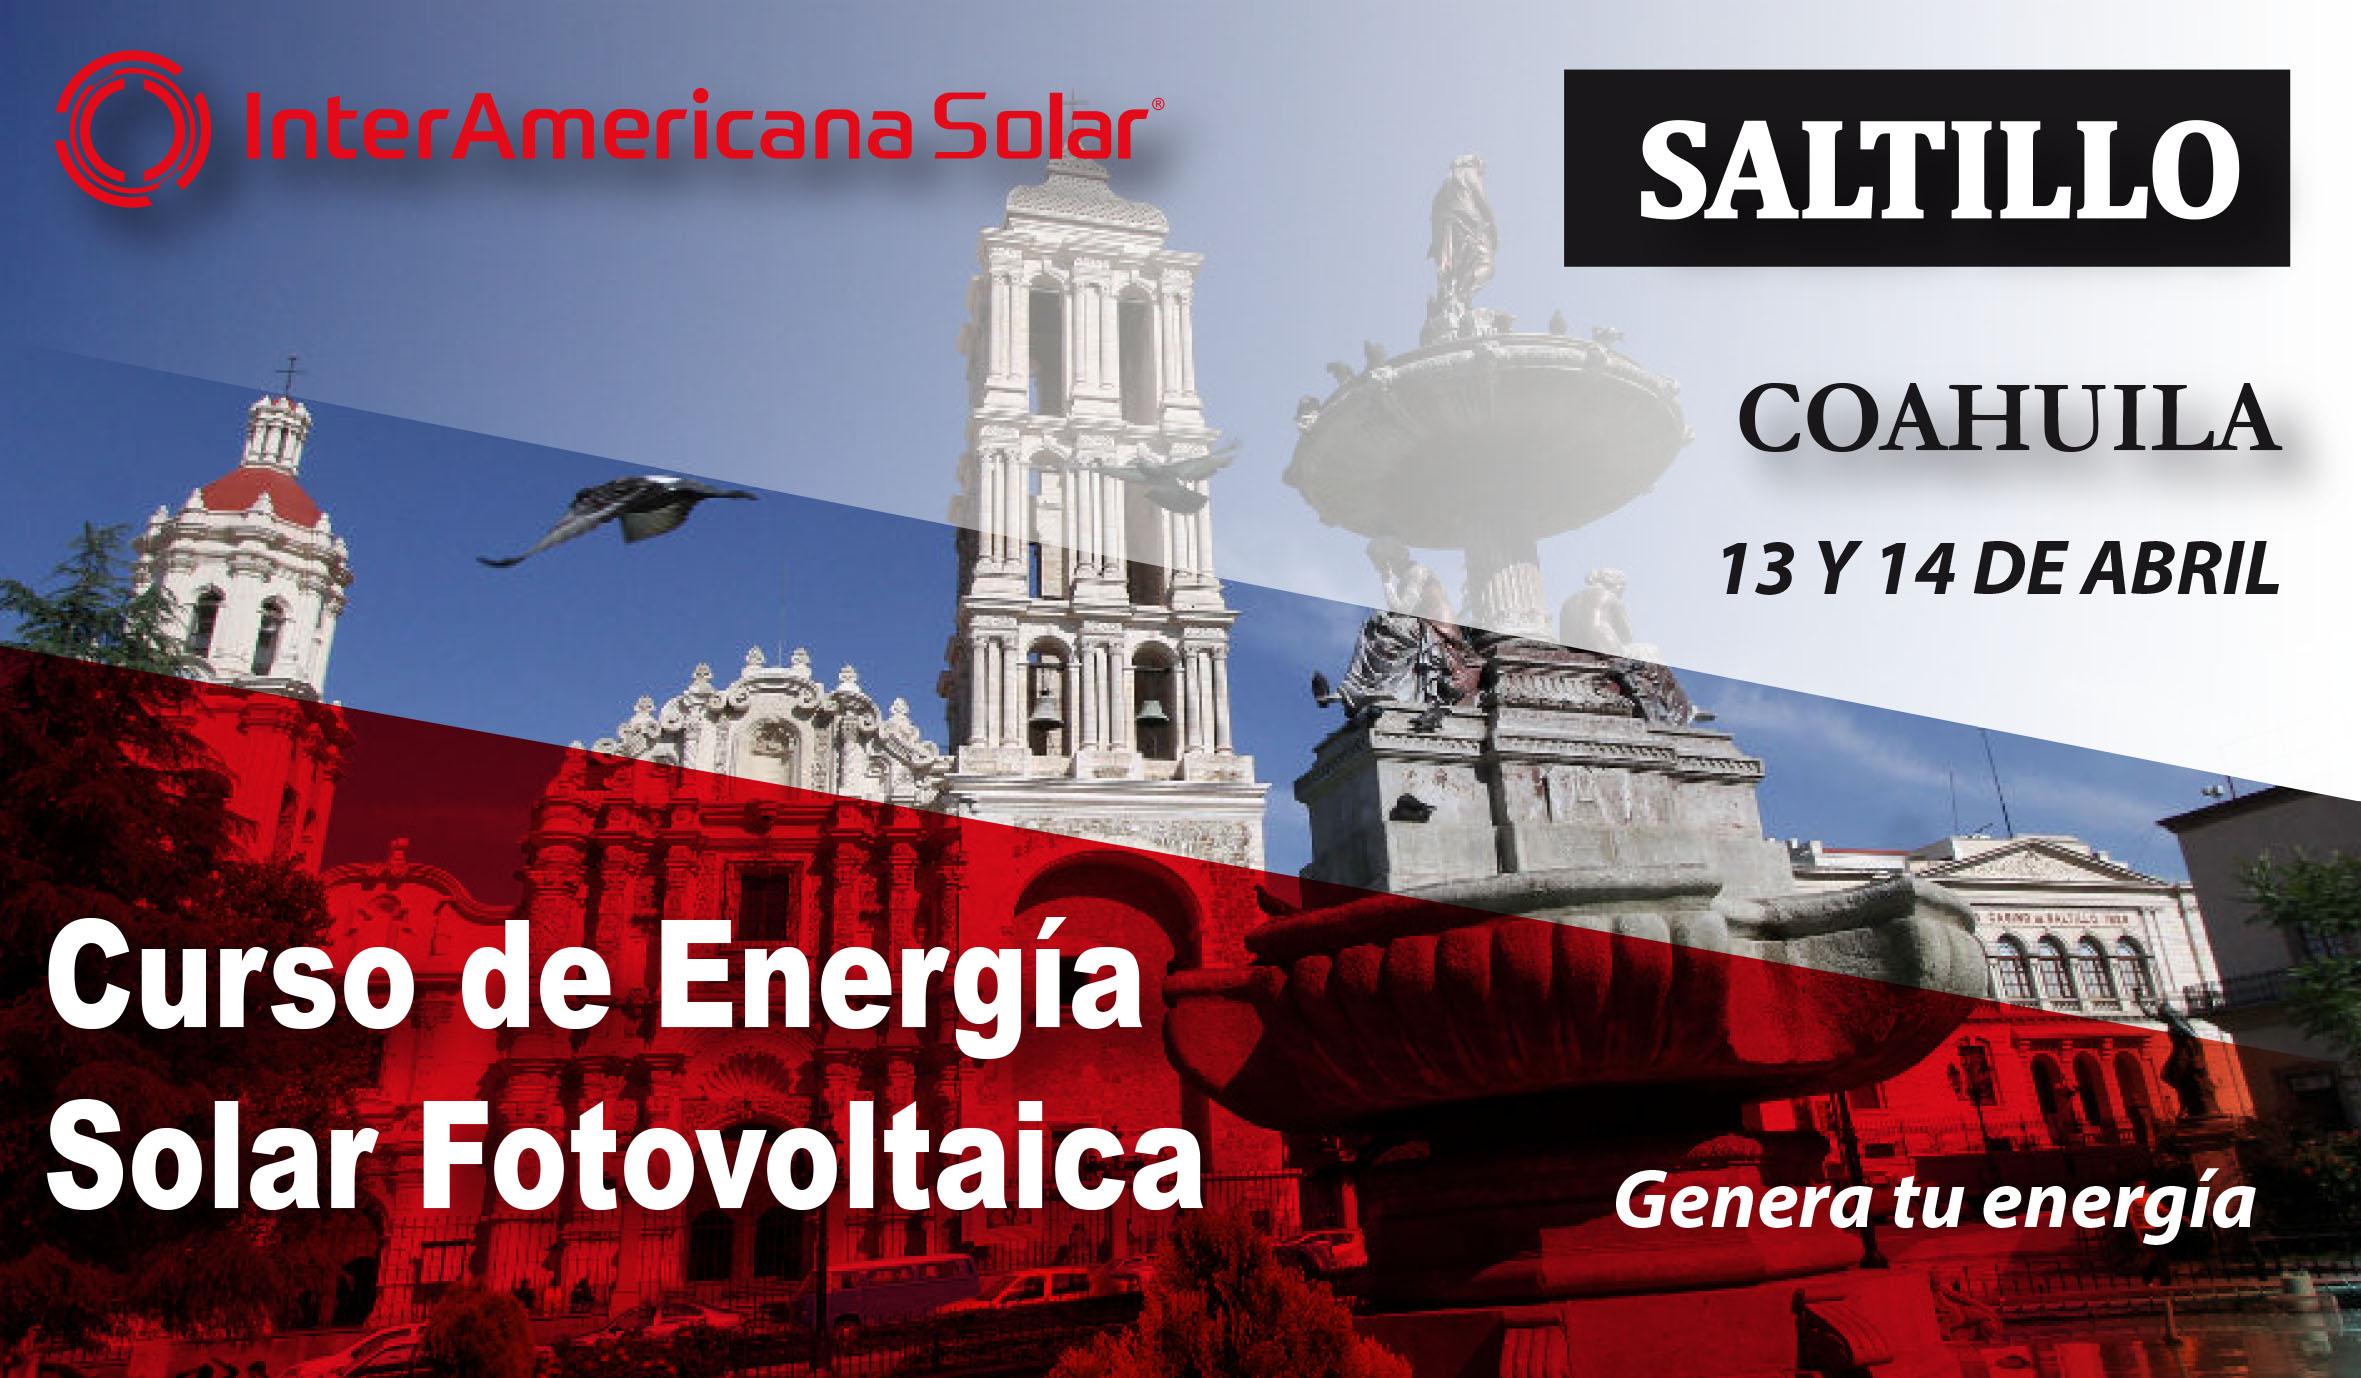 Cursos De Paneles Solares En Monterrey Interamericana Solar